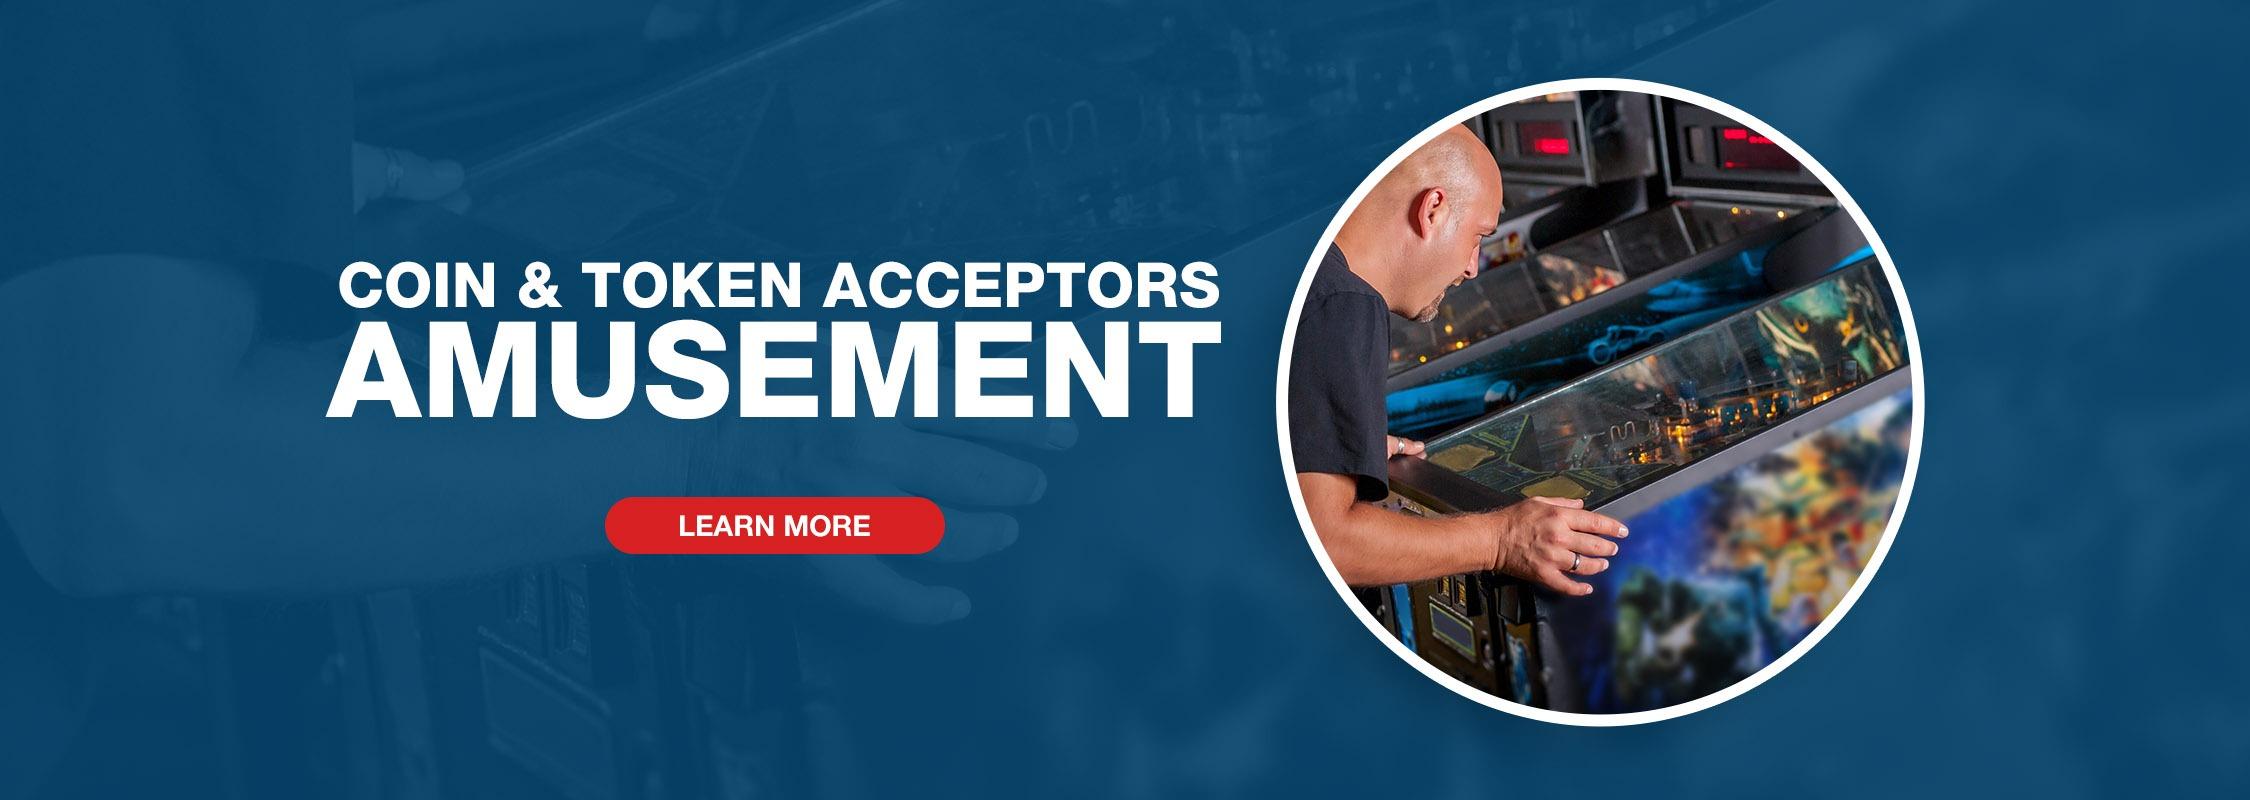 Imonex Coin & Token Acceptors - Amusement Image